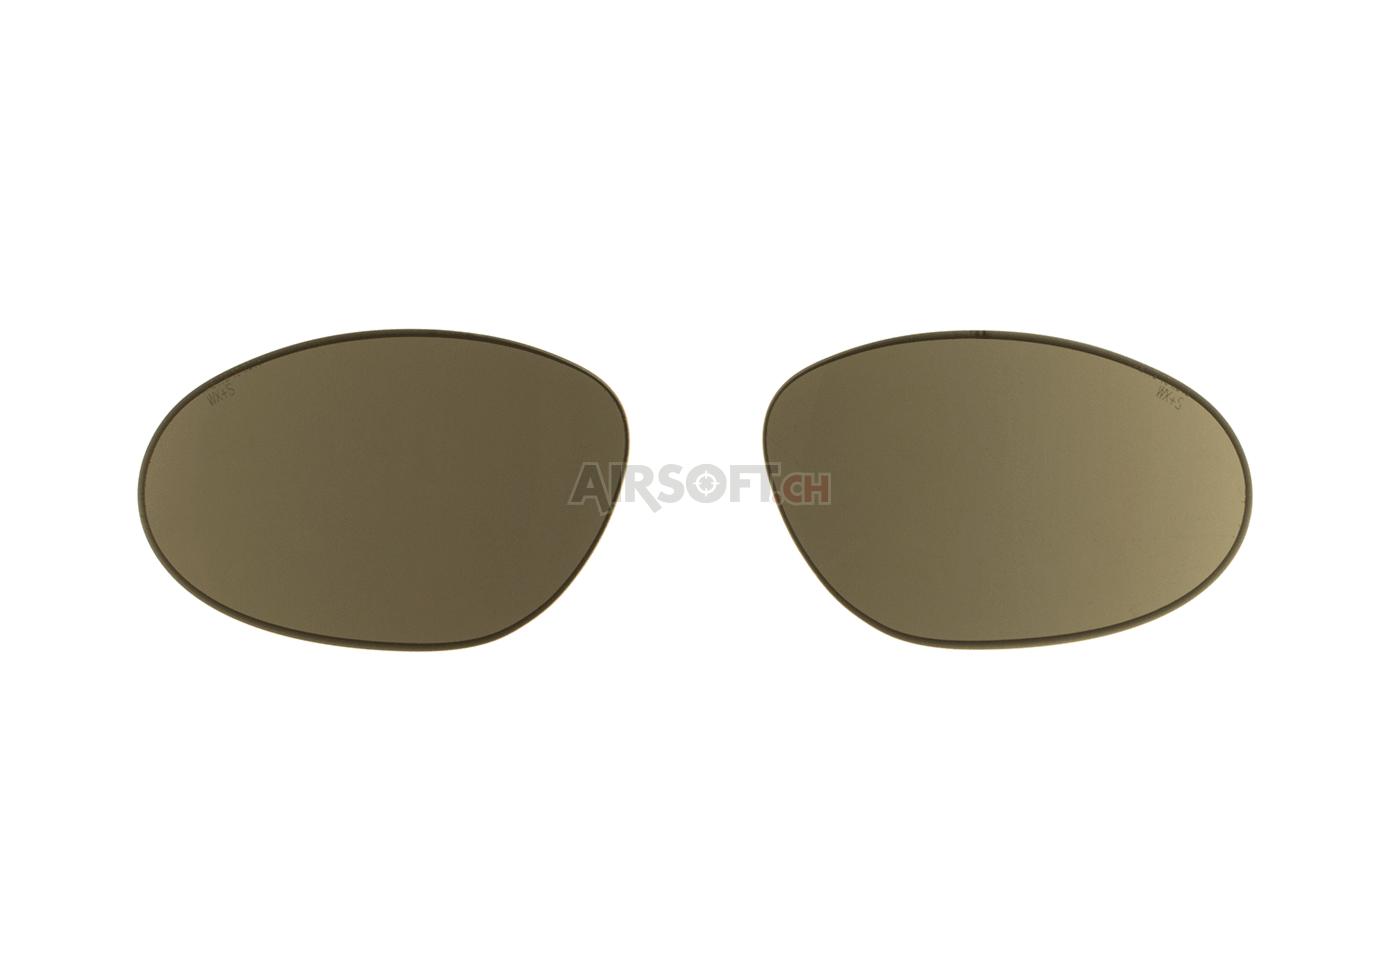 76392efda XL-1 Advanced Goggles Lens Smoke (Wiley X) - Gläser - Schutzbrillen ...